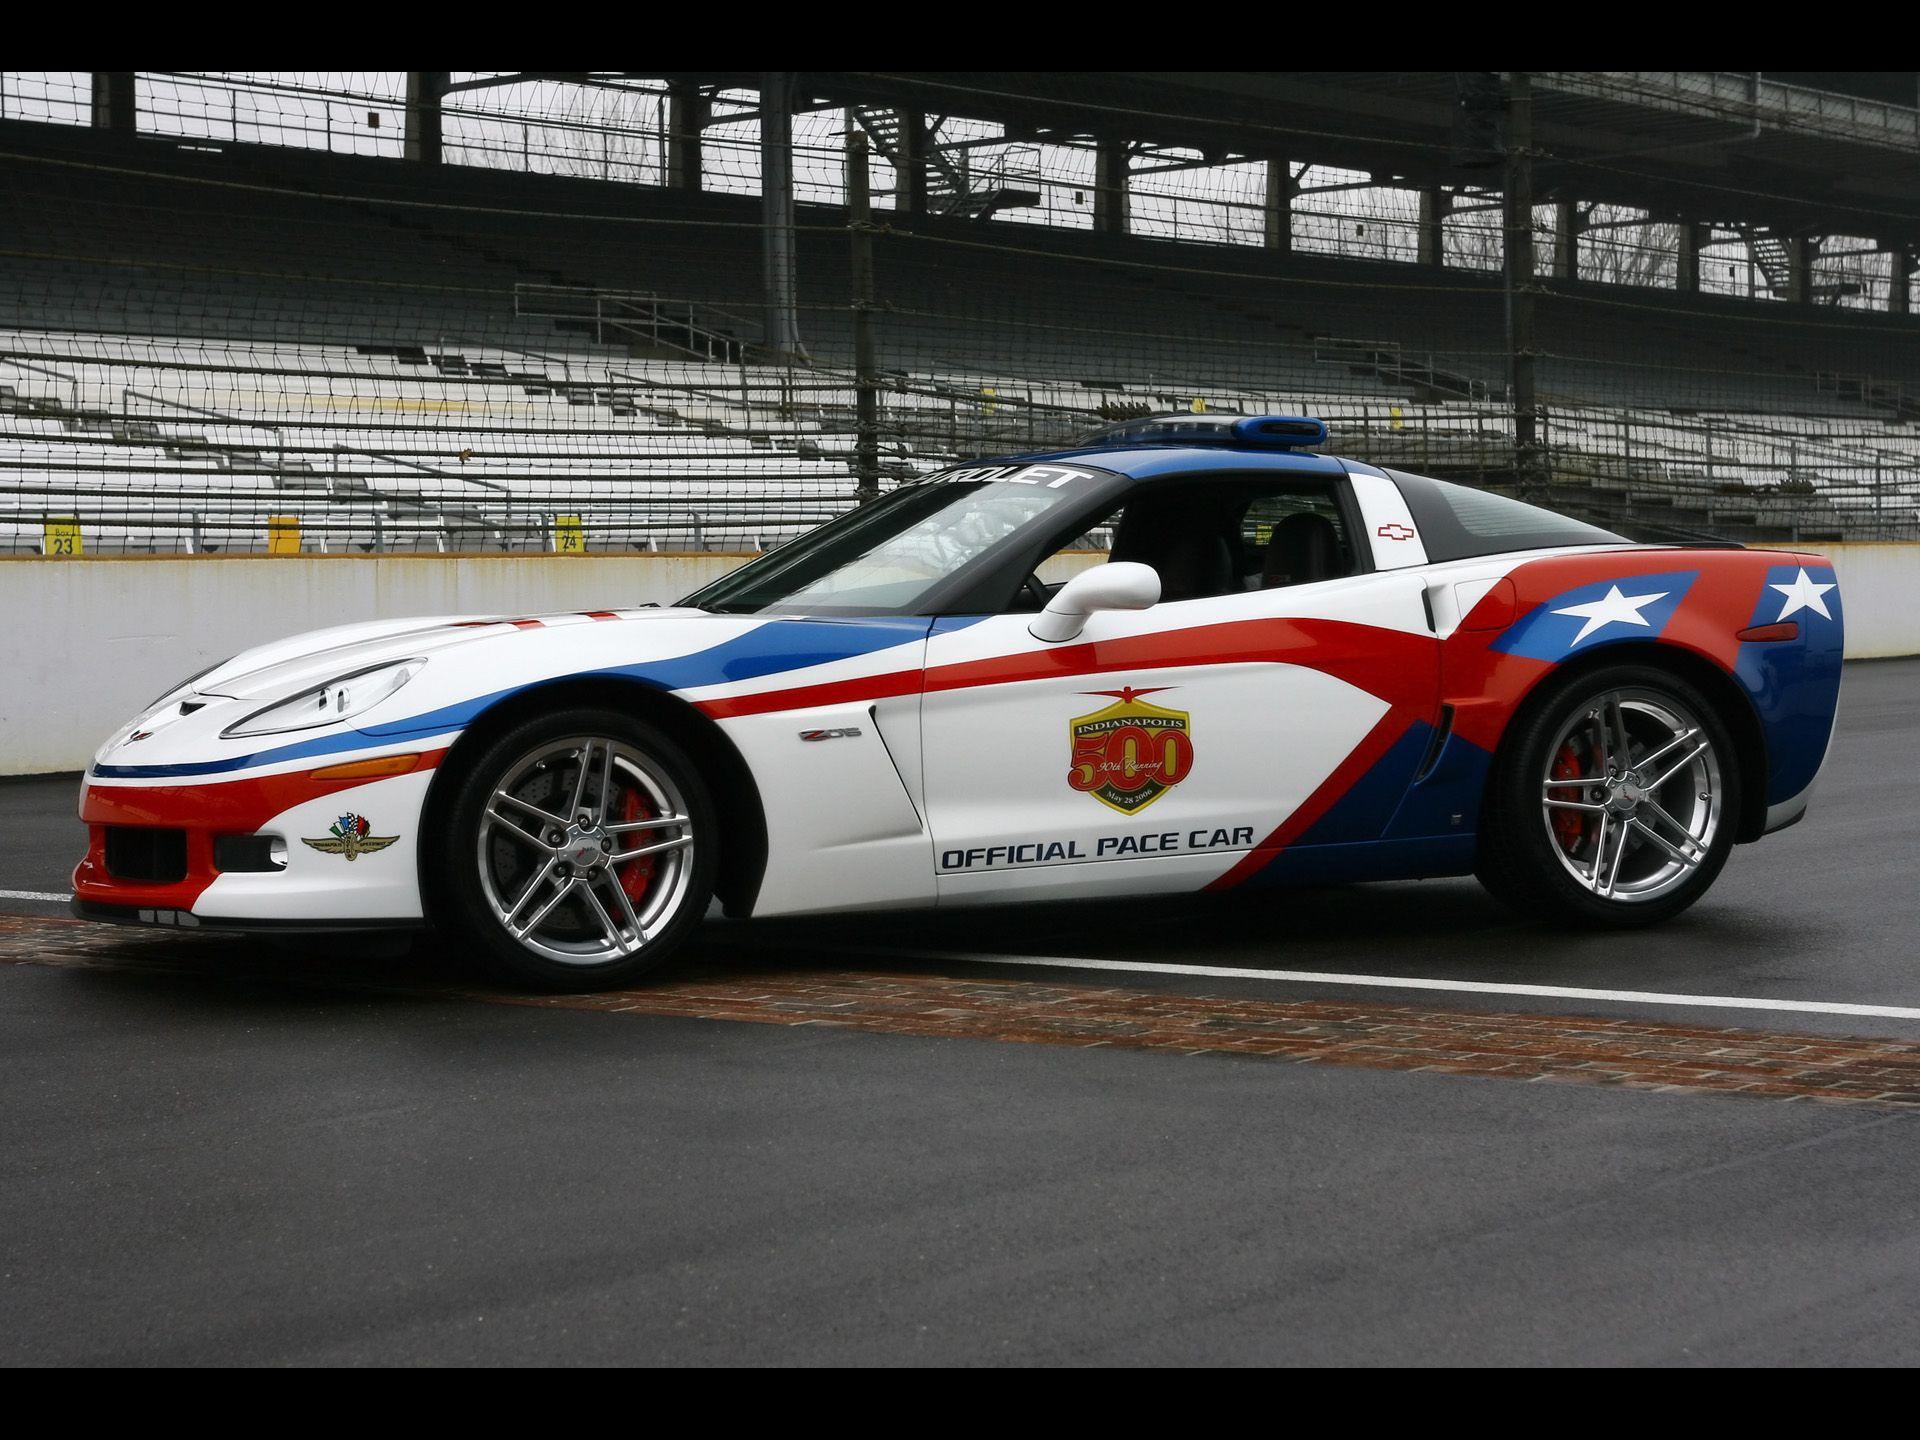 Diecast king maisto 1998 chevrolet corvette indy 500 pace car - 2006 Chevrolet Corvette Z06 Indianapolis 500 Pace Car